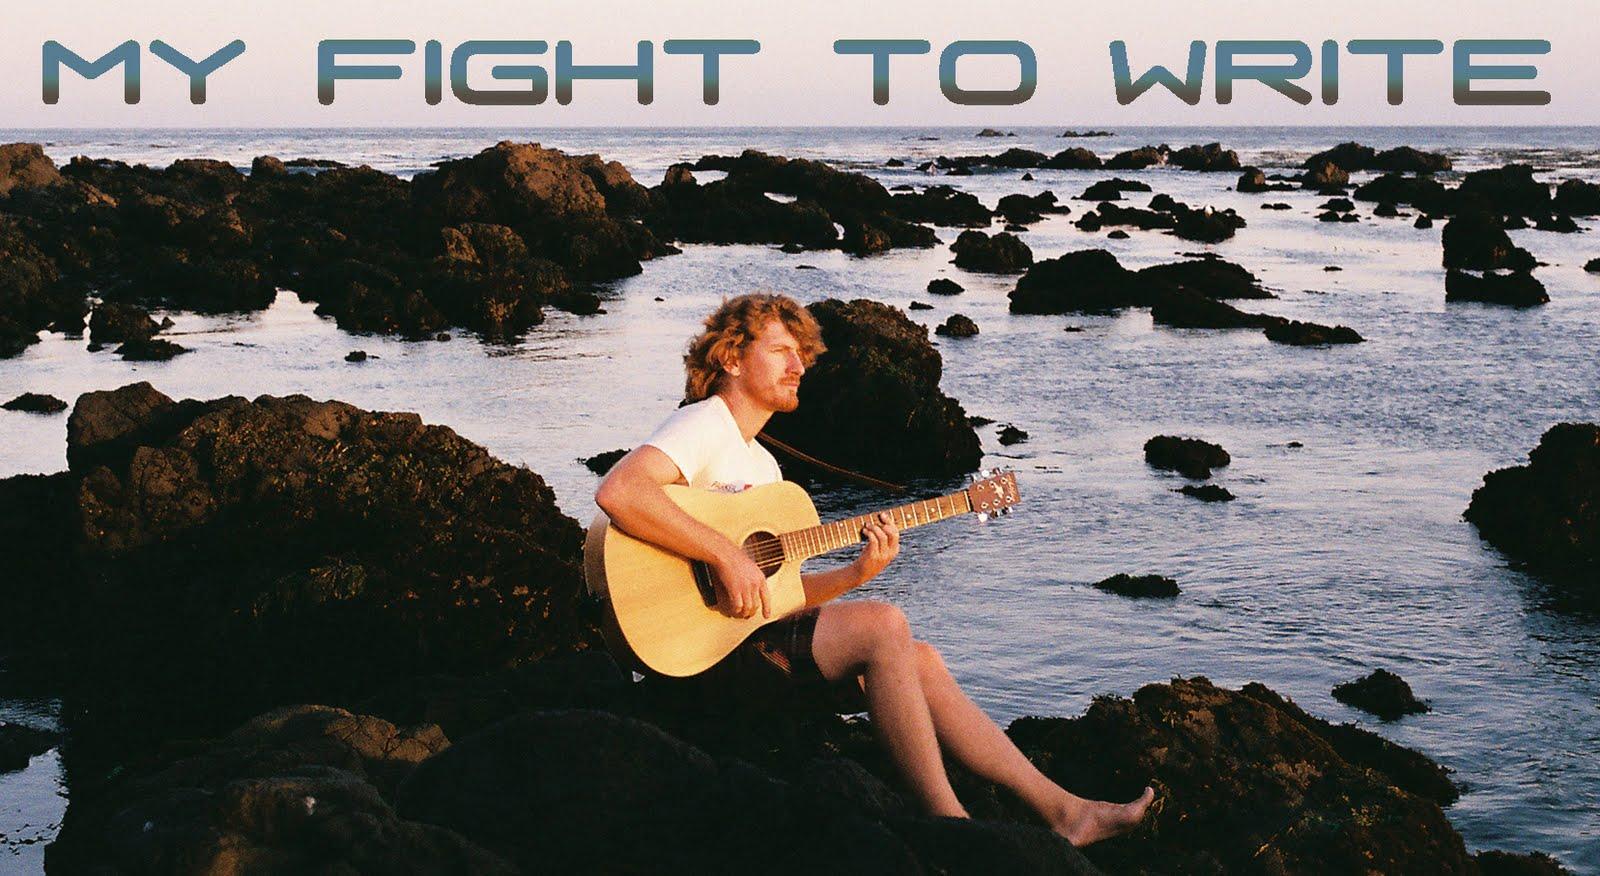 My Fight To Write